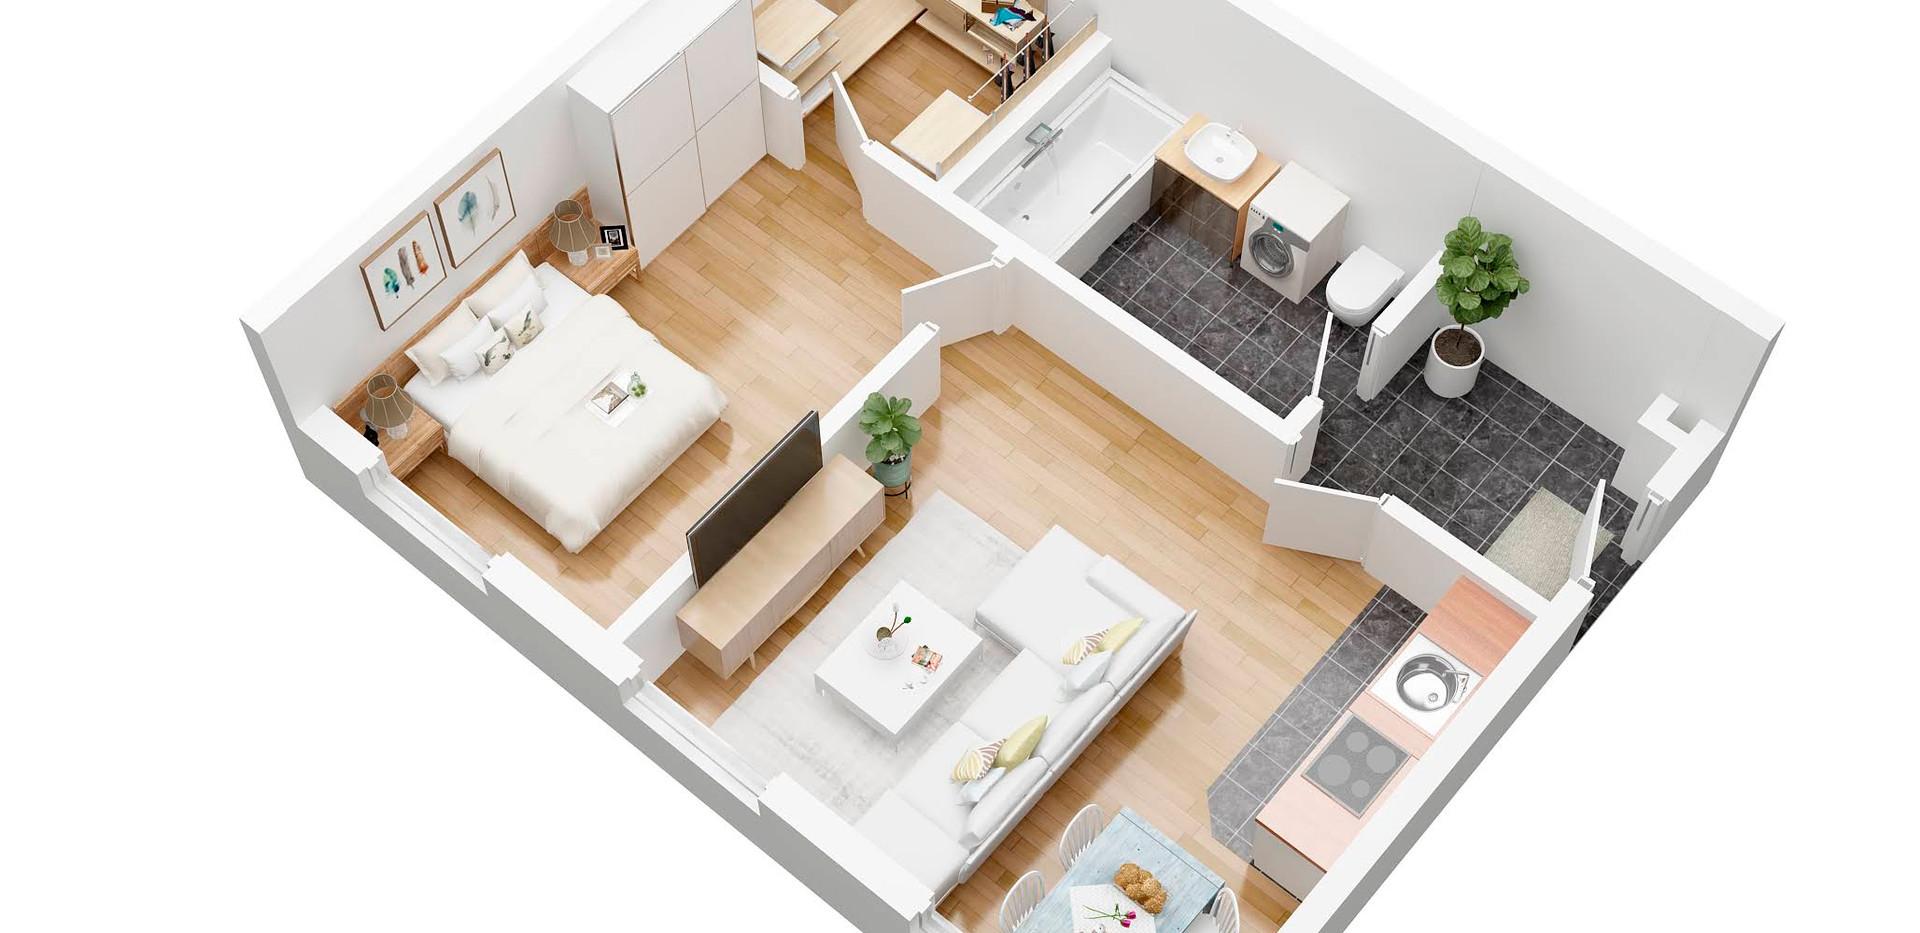 steinadlerat_6A_Perspective_3D  floor plan